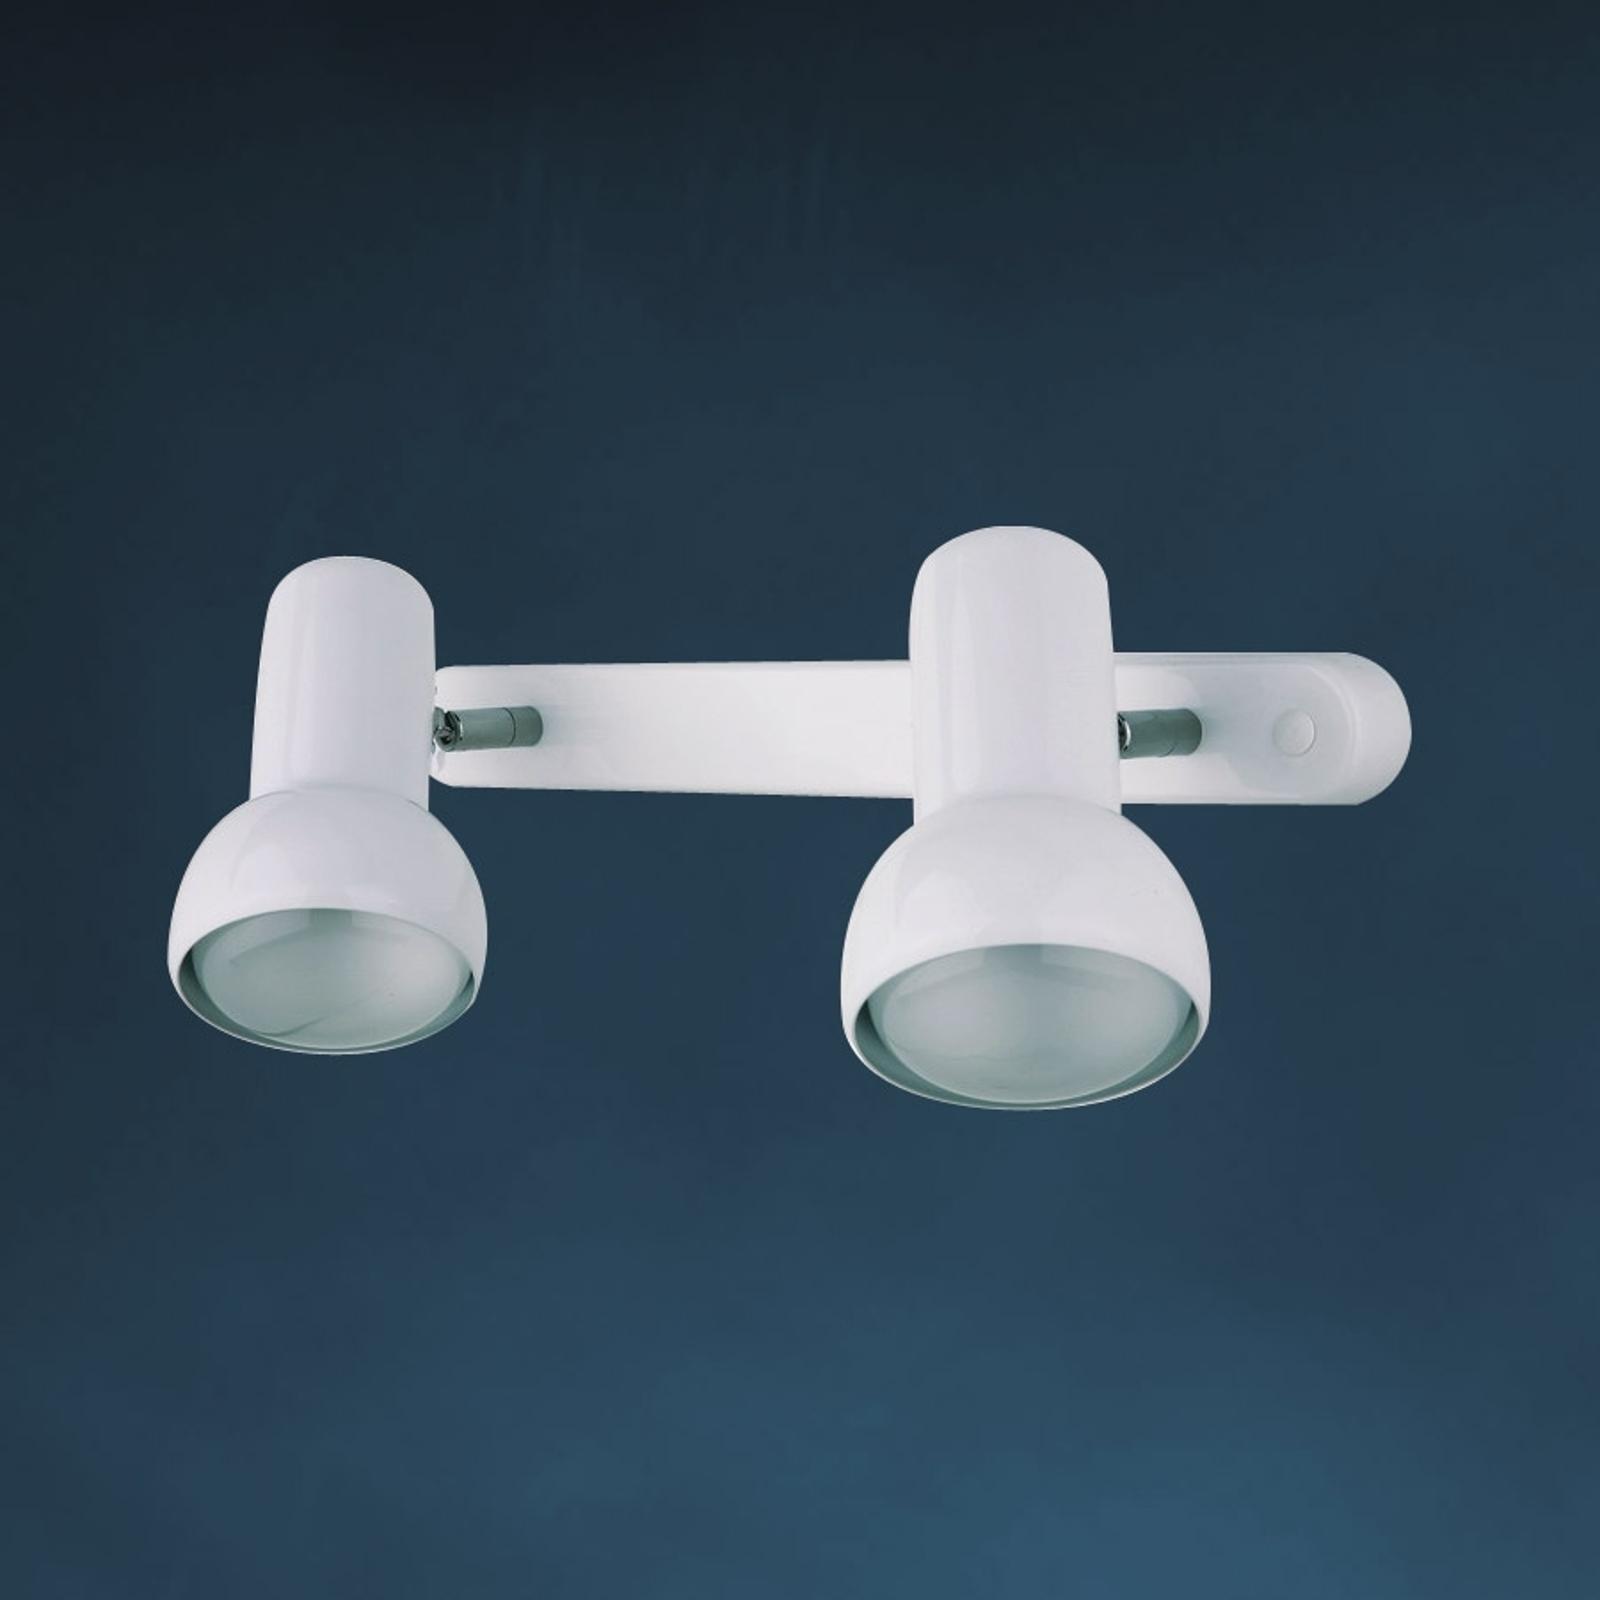 Wandlamp EIFEL in retrodesign 2-lichts